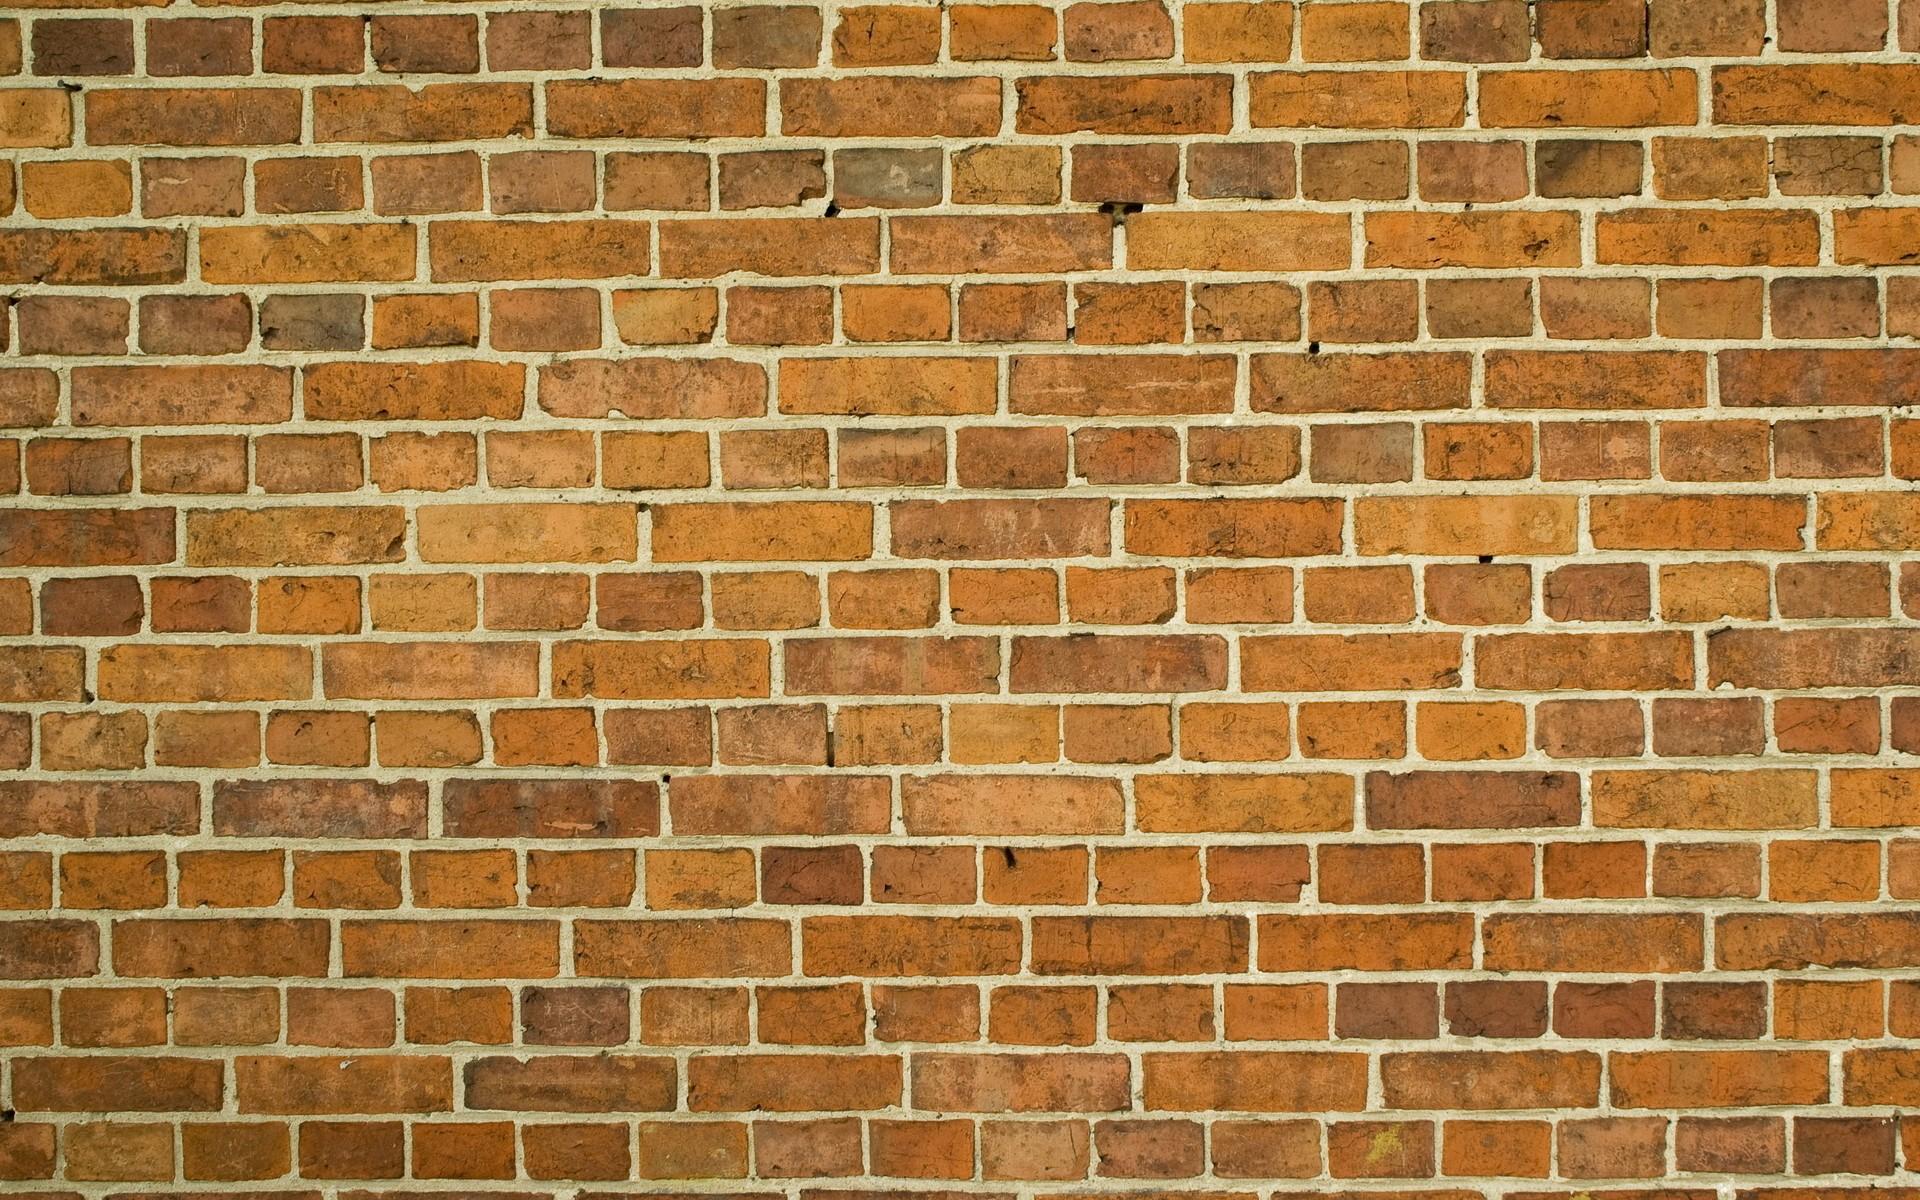 Textura de pared de ladrillos 2 - 1920x1200